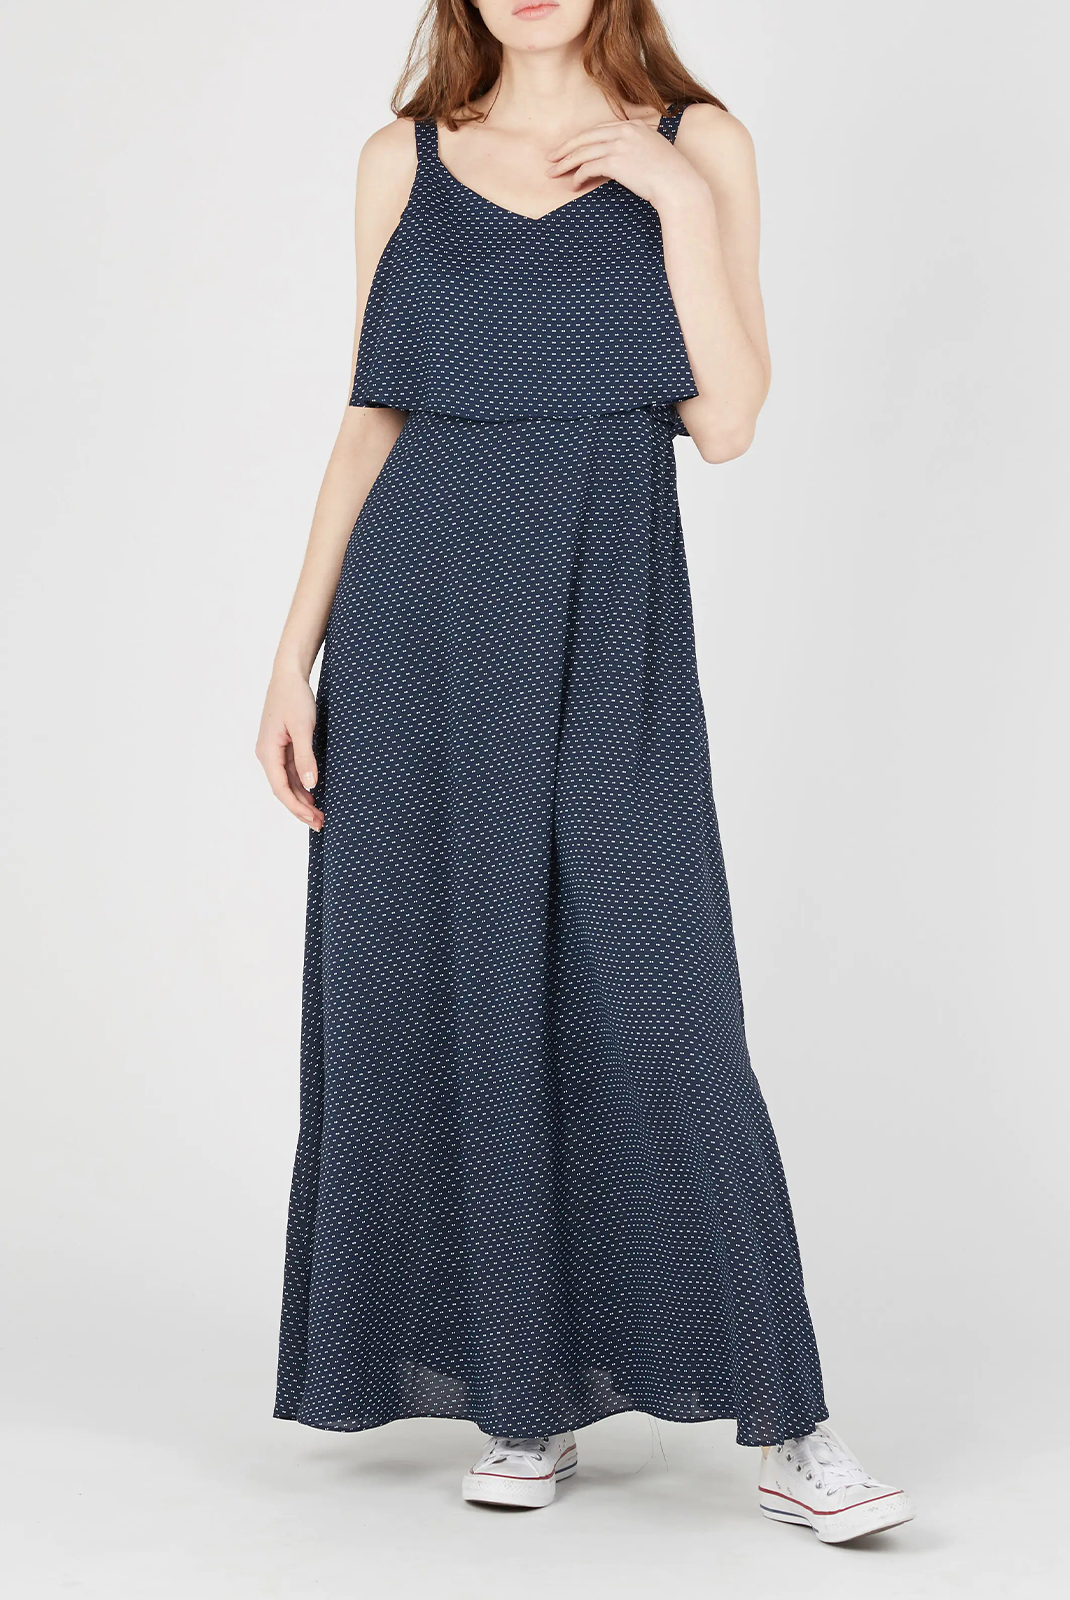 Robes  Molly bracken T1202P20 NAVY